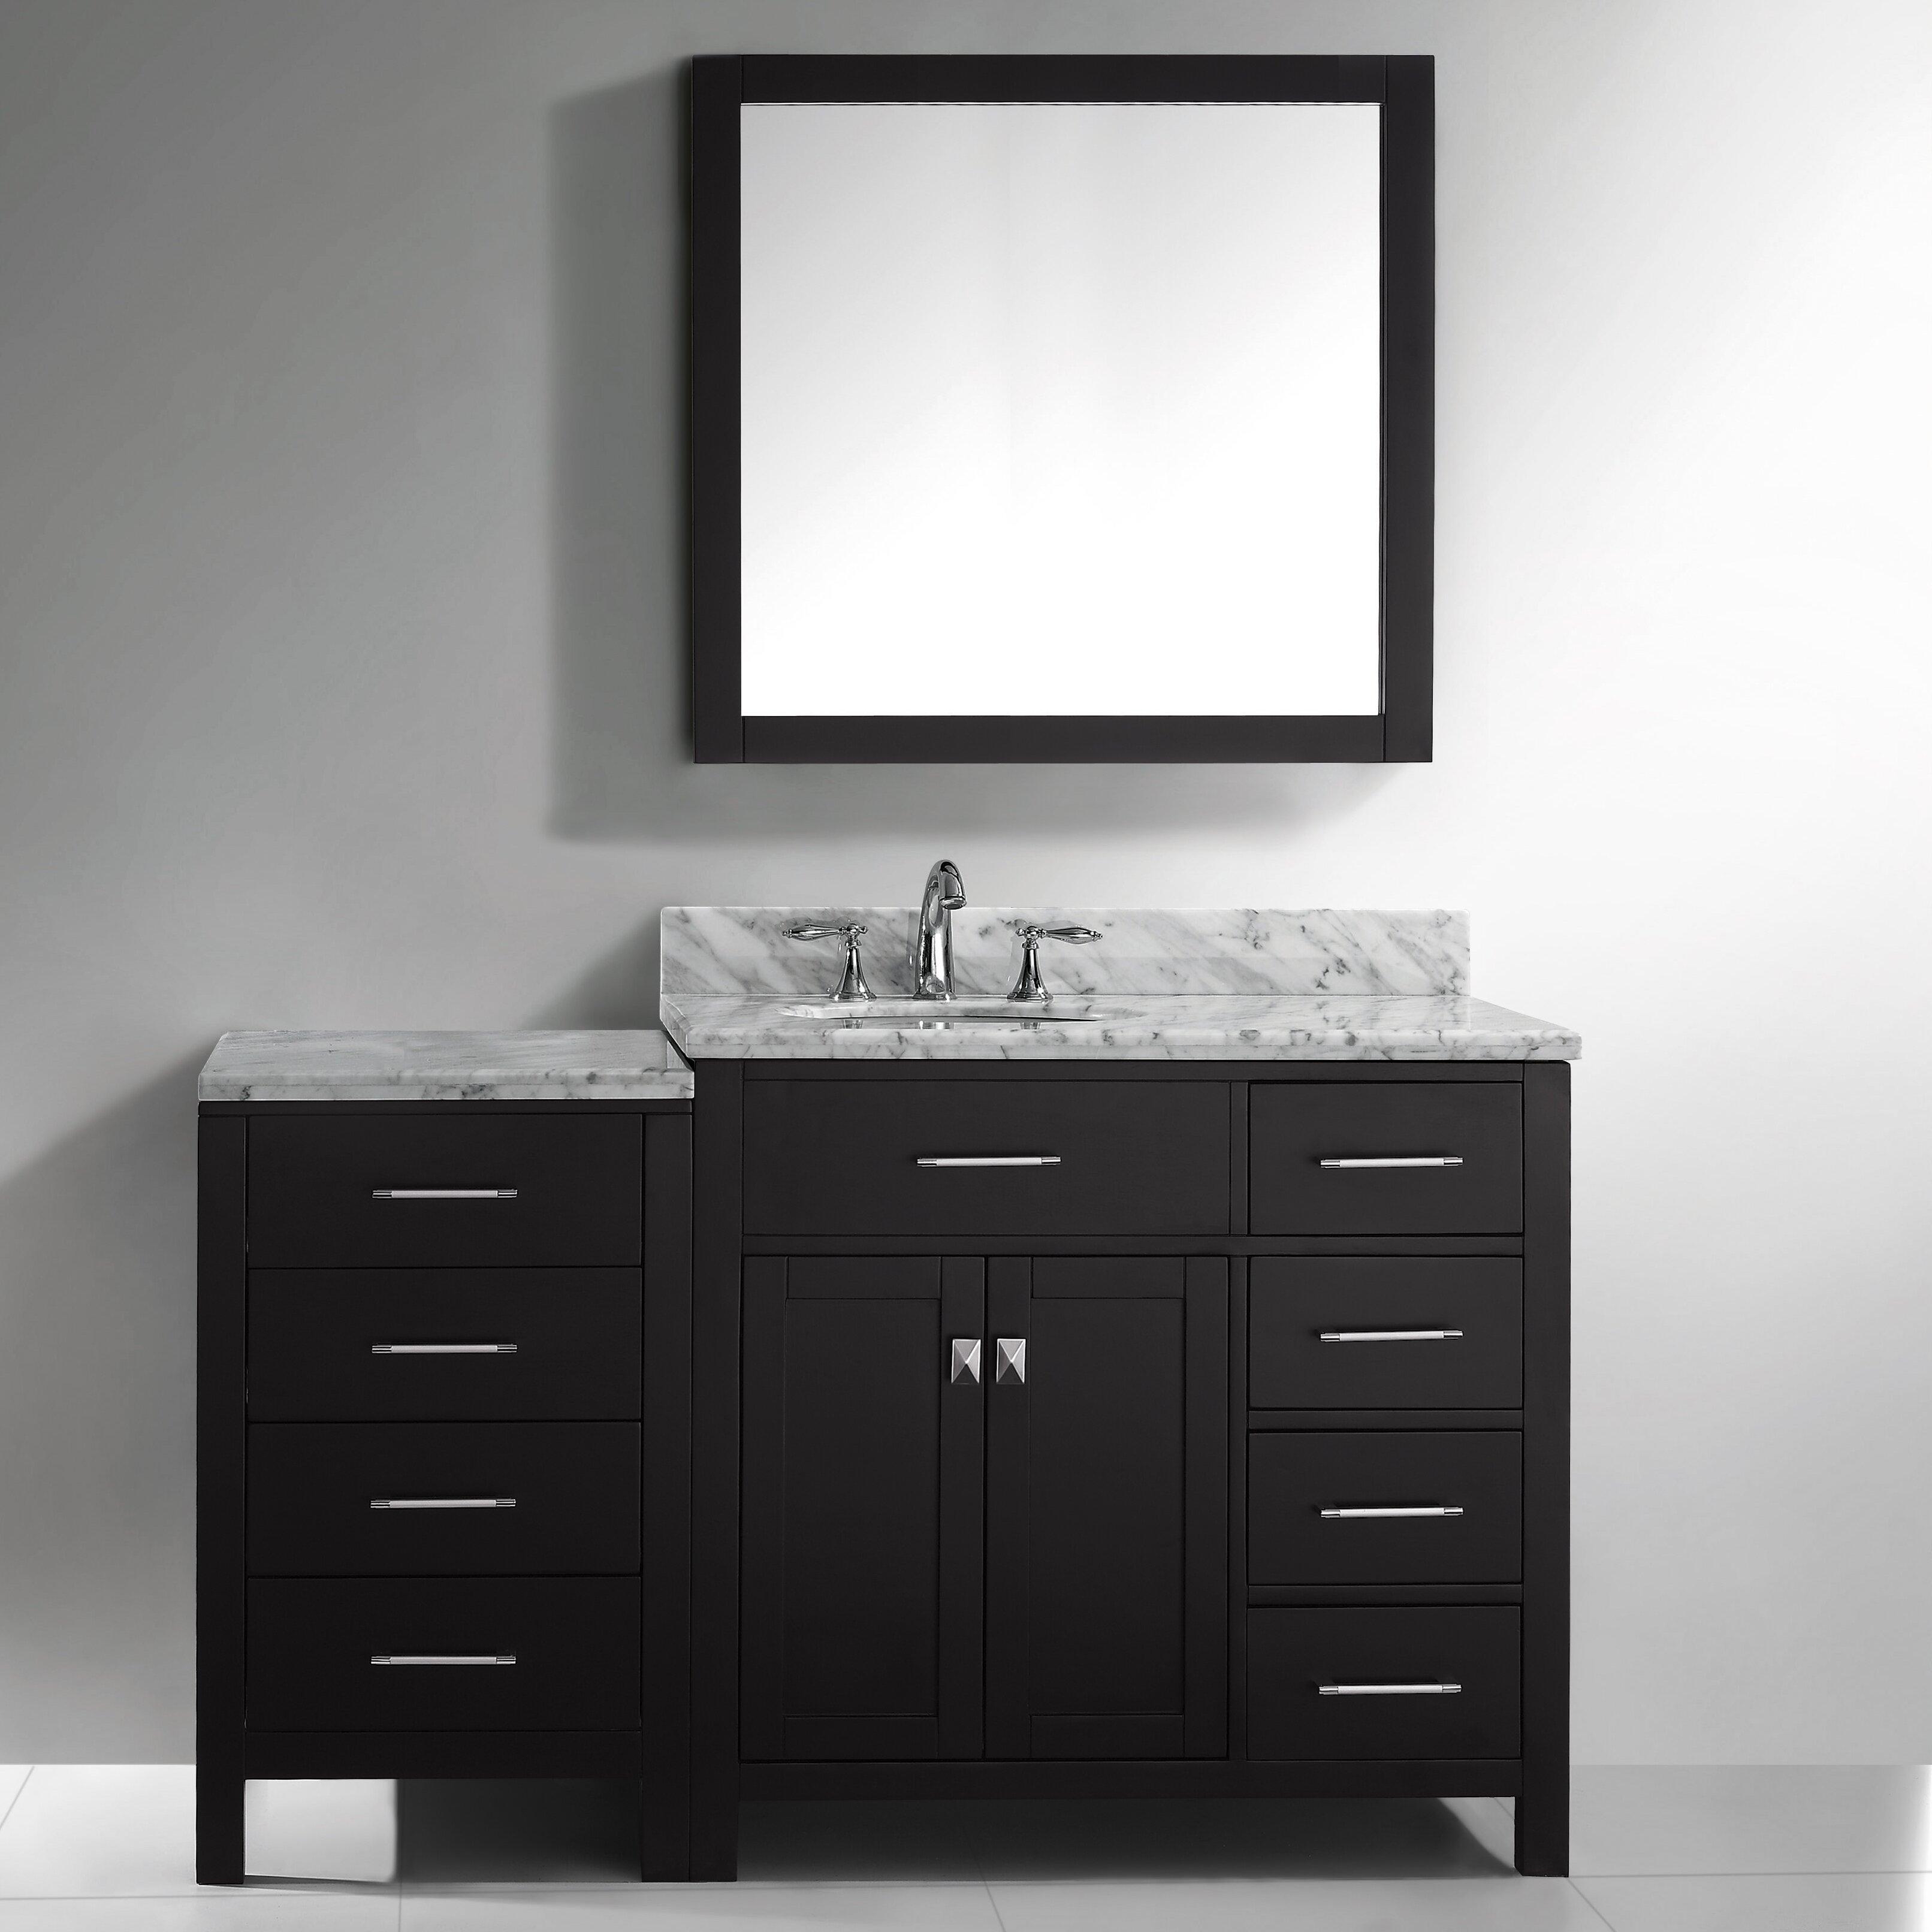 Virtu Caroline Parkway 57 Single Bathroom Vanity Set With Carrara White Top And Mirror